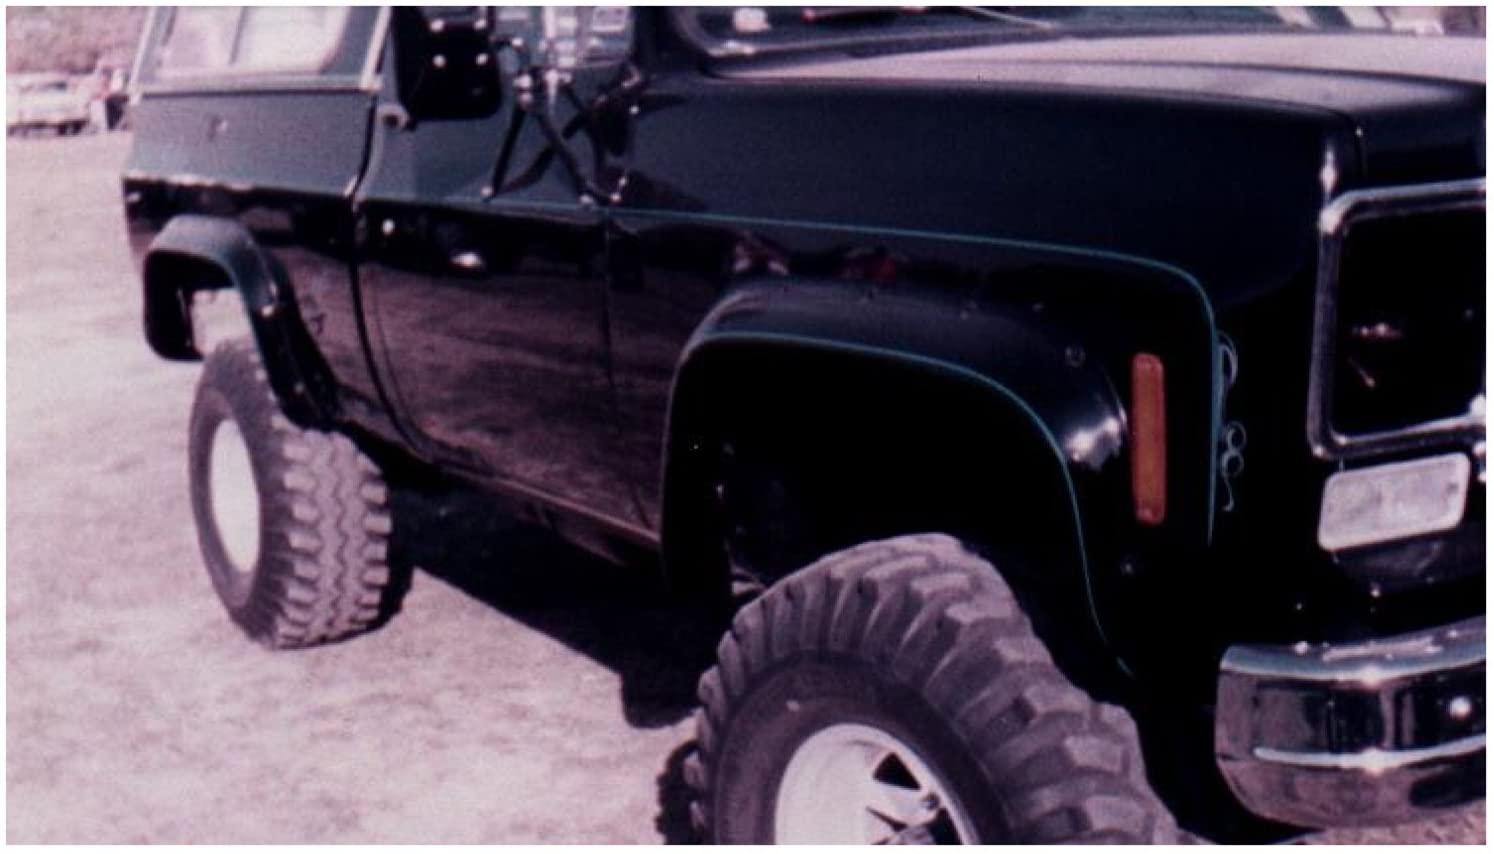 Bushwacker 40003-11 Chevrolet/GMC Cut-Out Fender Flare - Front Pair